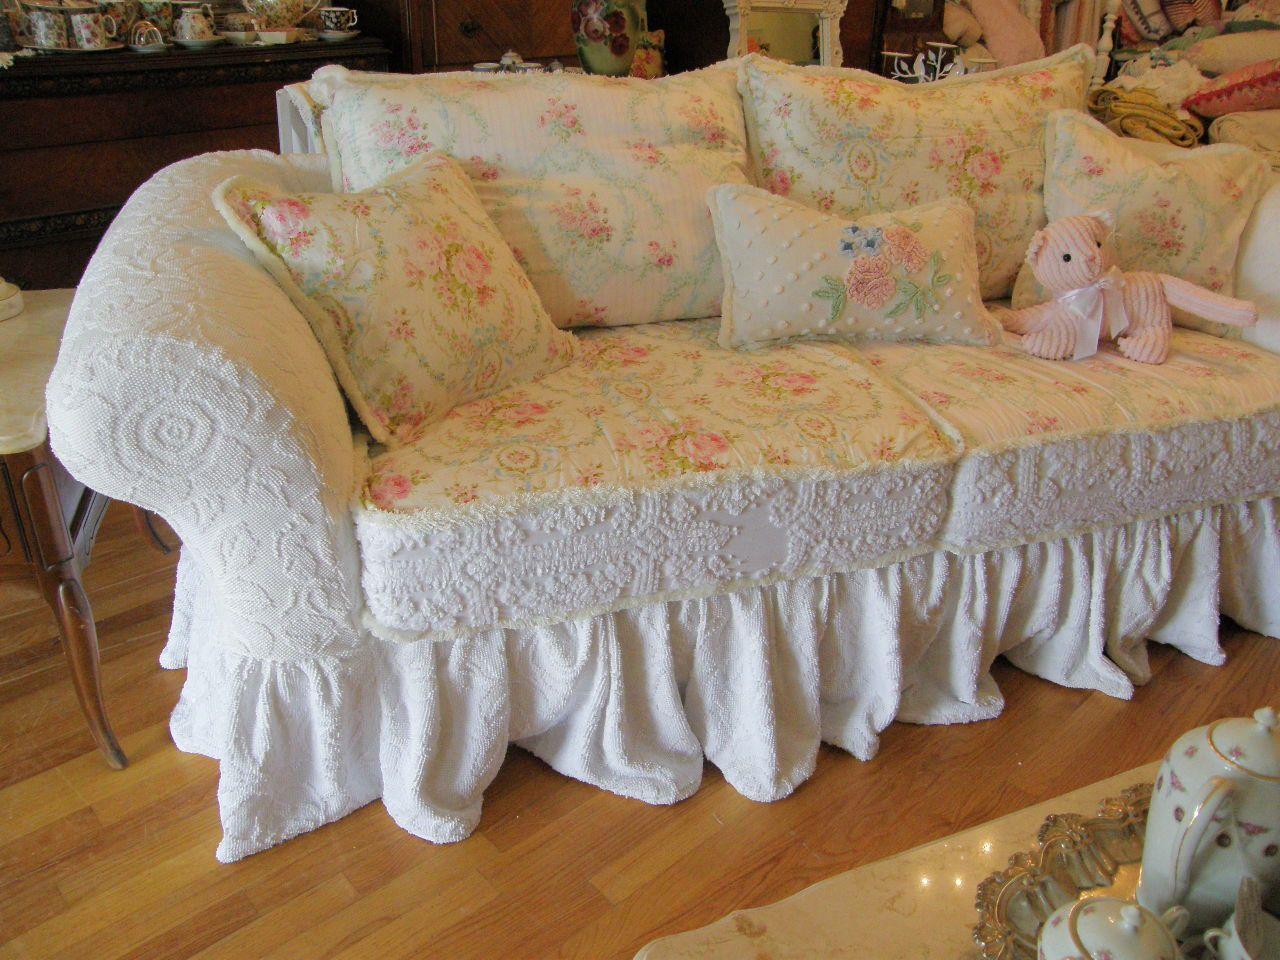 Custom Shabby Chic Sofa Chenille Bedspread By Vintagechicfurniture 2 200 00 Shabby Chic Couch Shabby Chic Sofa Shabby Chic Slipcovers